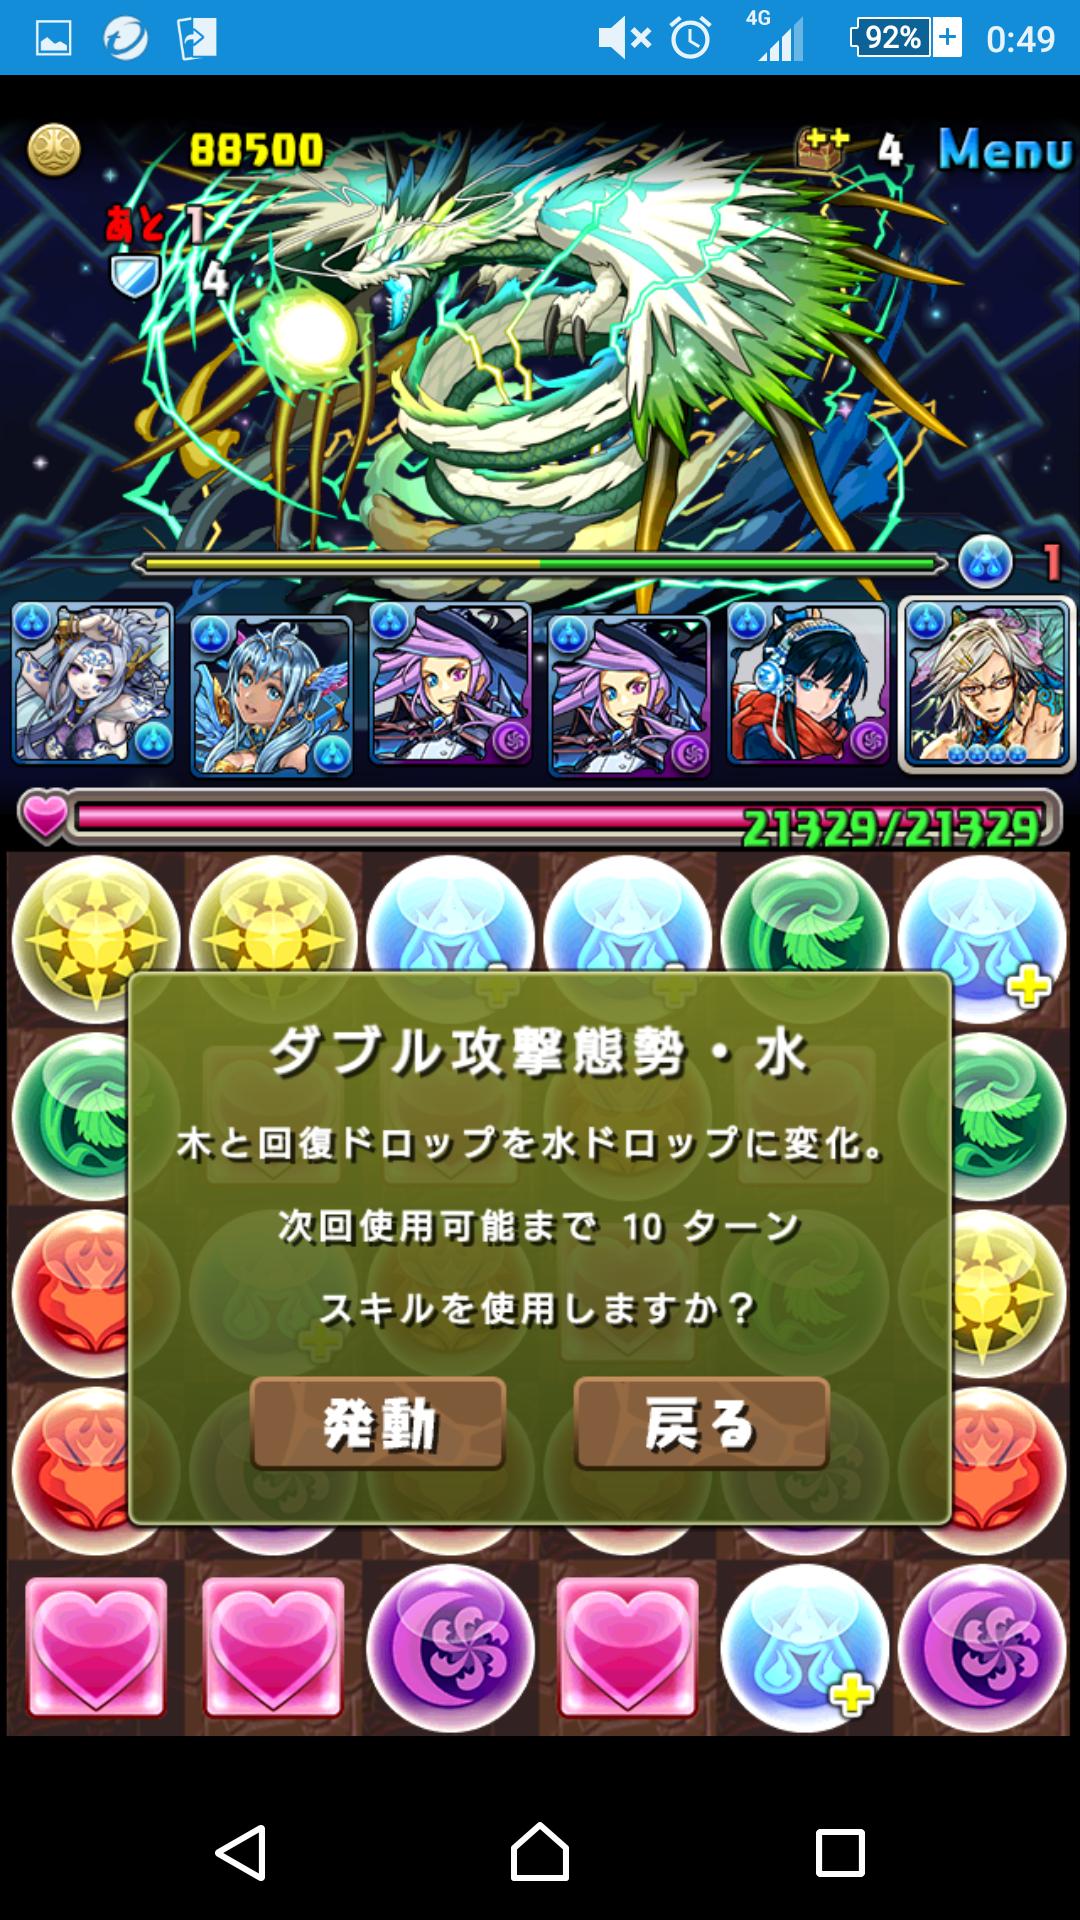 Screenshot_2016-05-16-00-49-31.png